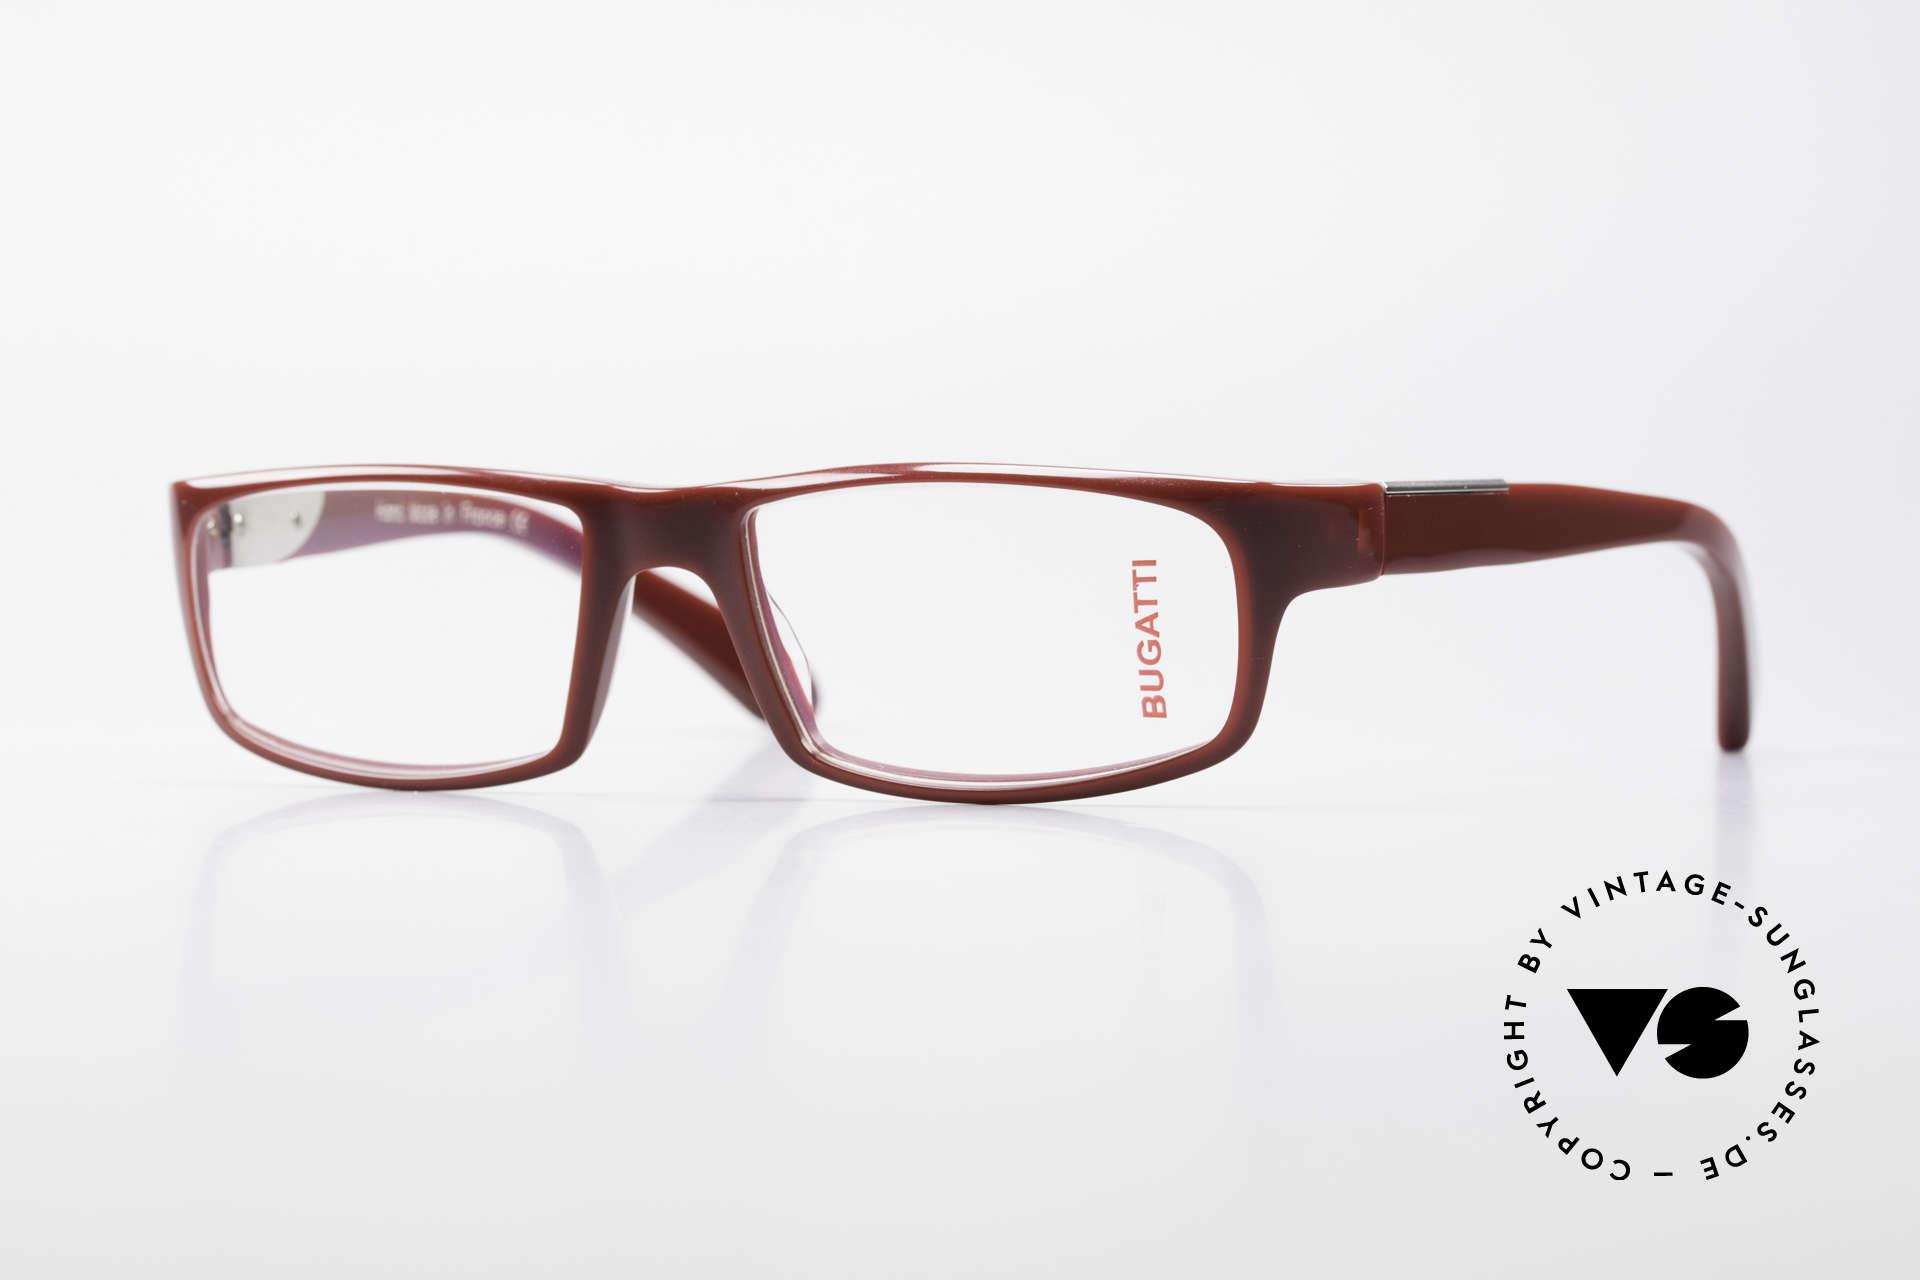 Bugatti 532 Striking Luxury Glasses Men, striking plastic eyeglass-frame by BUGATTI, Made for Men